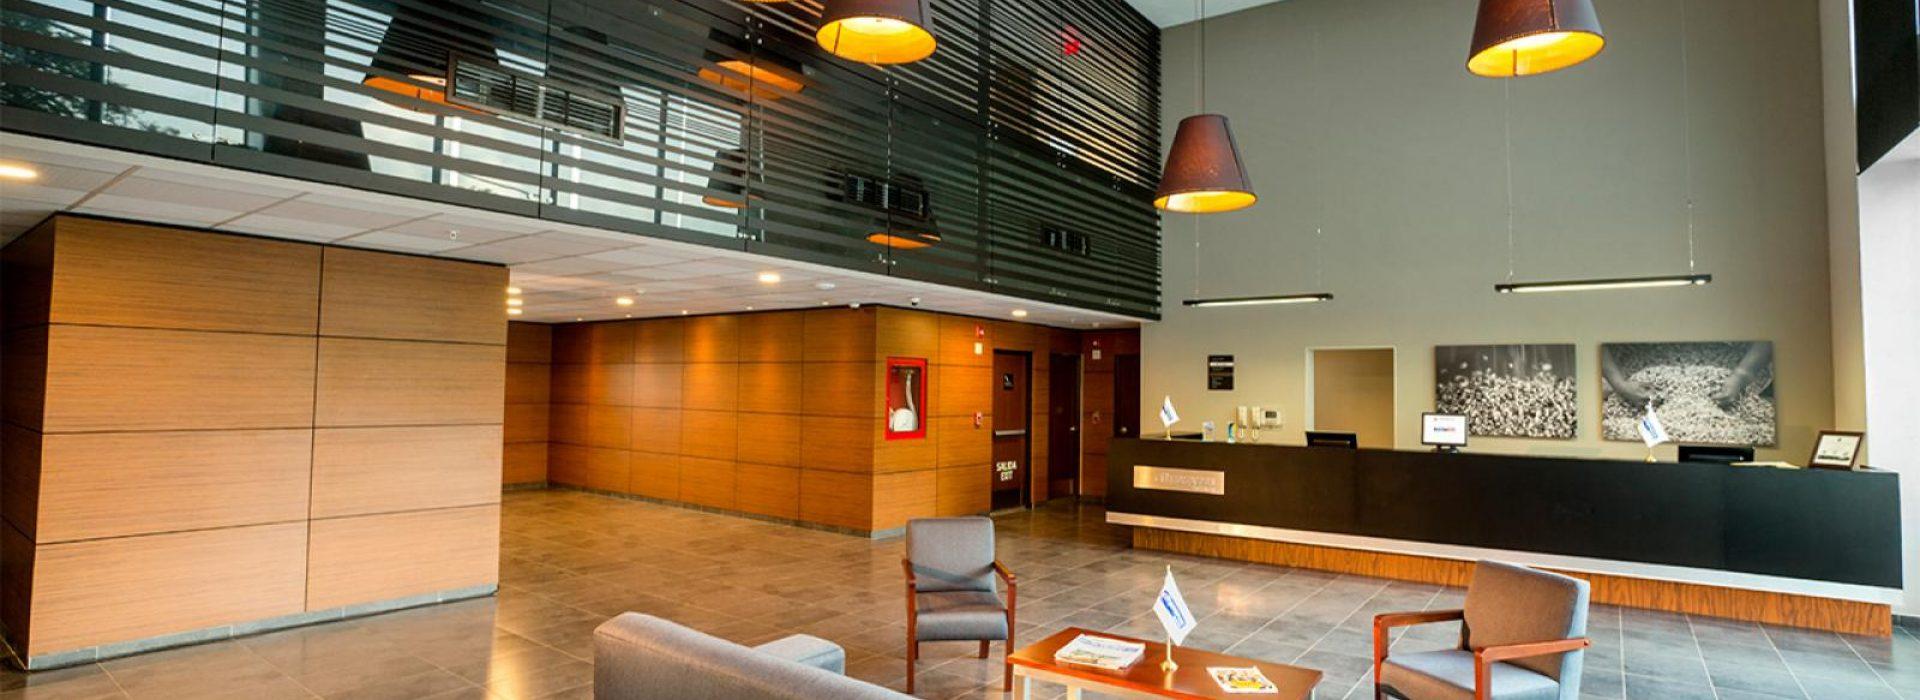 hotel-cali-colombia-city-express-plus-recepcion-lobby